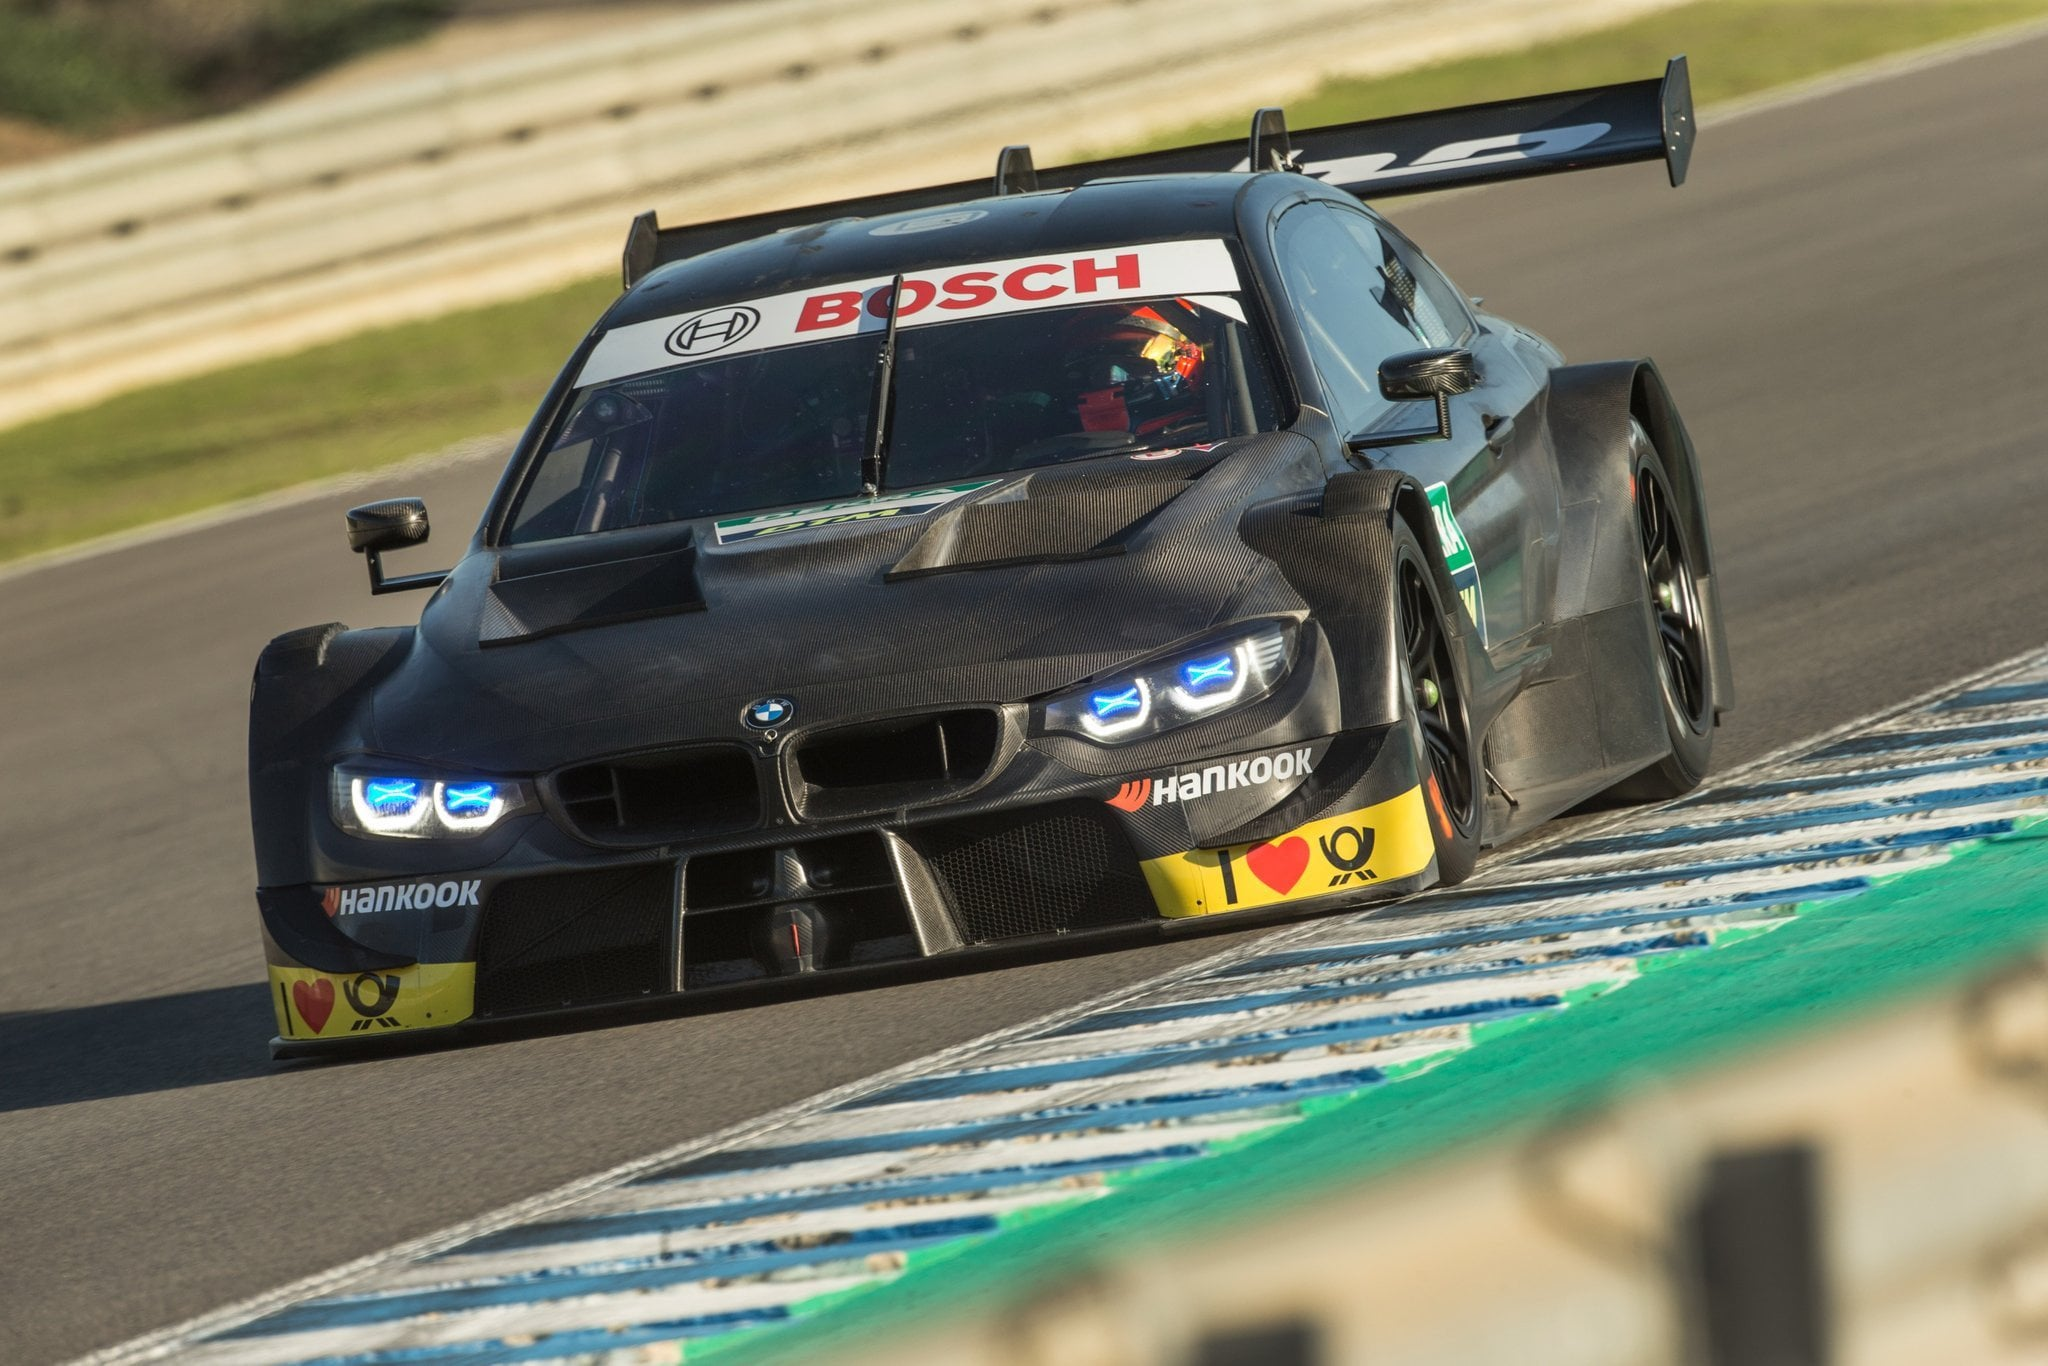 Robert_Kubica_BMW_M4_DTM_0003